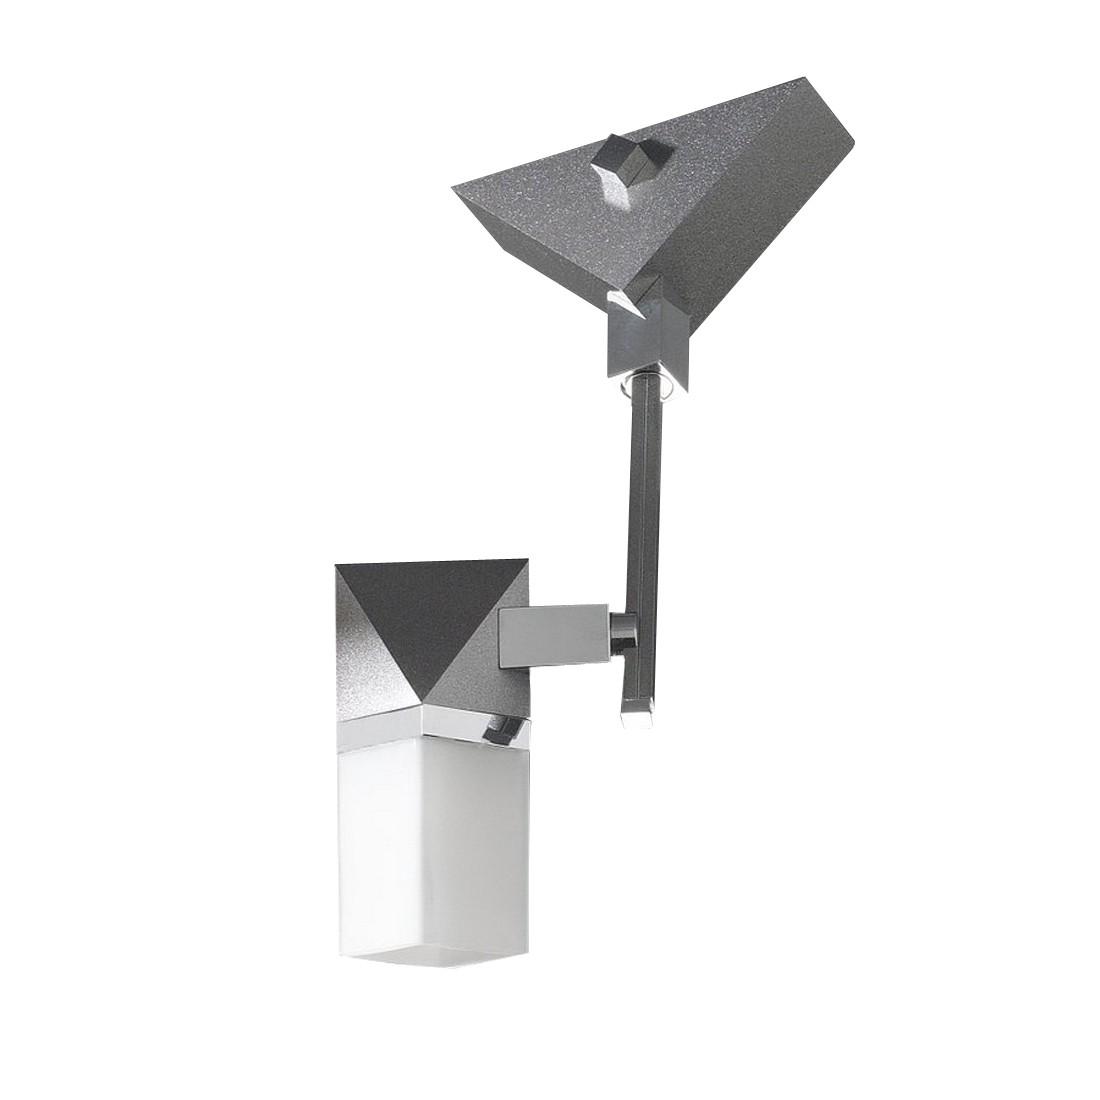 EEK A++, Decken-/Wandleuchte Alutop G1 – 1-flammig – Terra-Metalica/Chrom, In-Nova Design kaufen